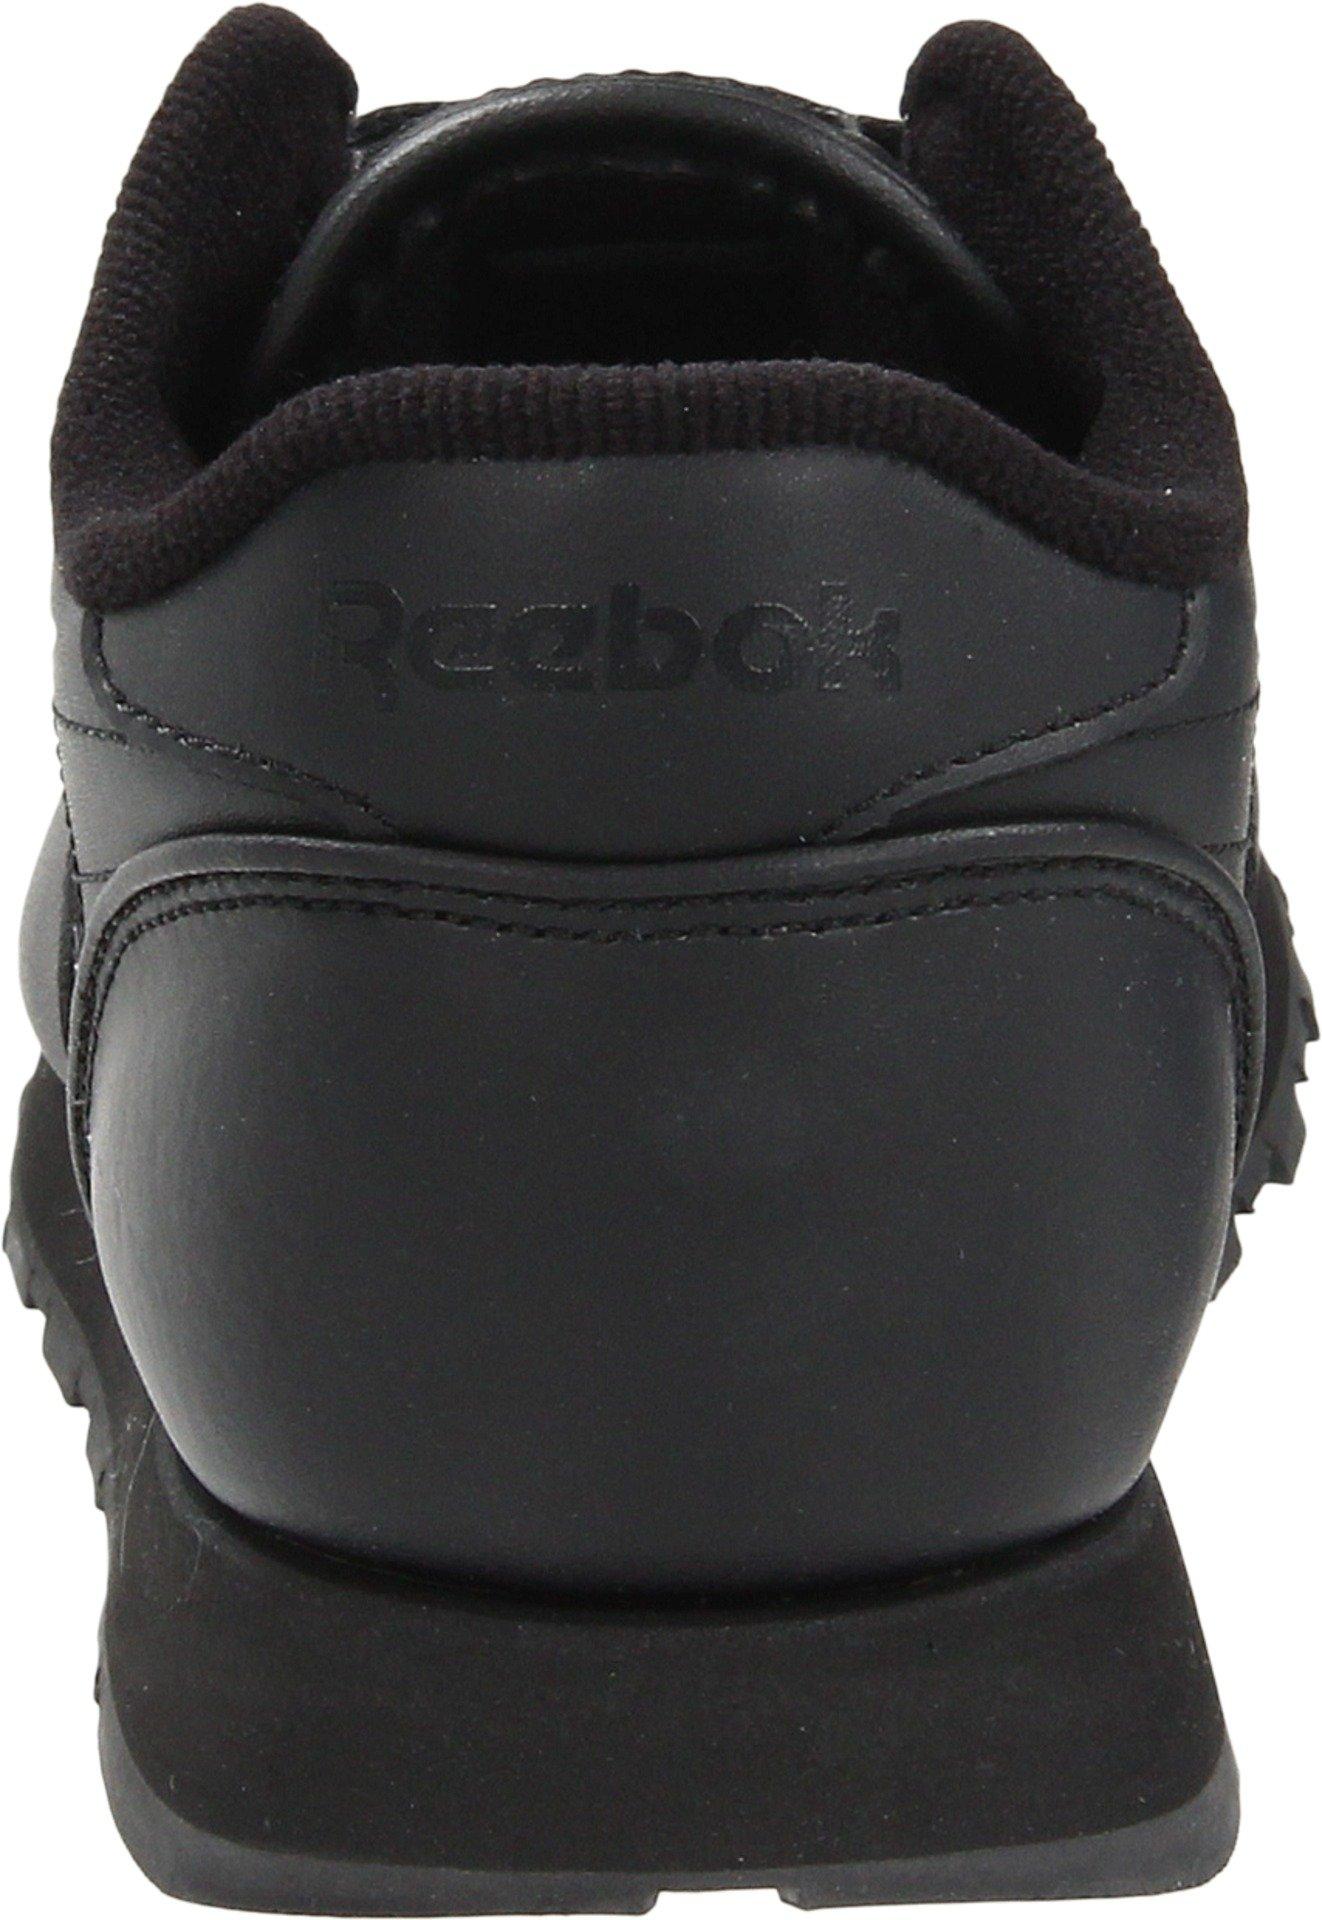 Reebok Classic Leather Shoe,Black/Black/Black,11.5 M US Little Kid by Reebok (Image #2)